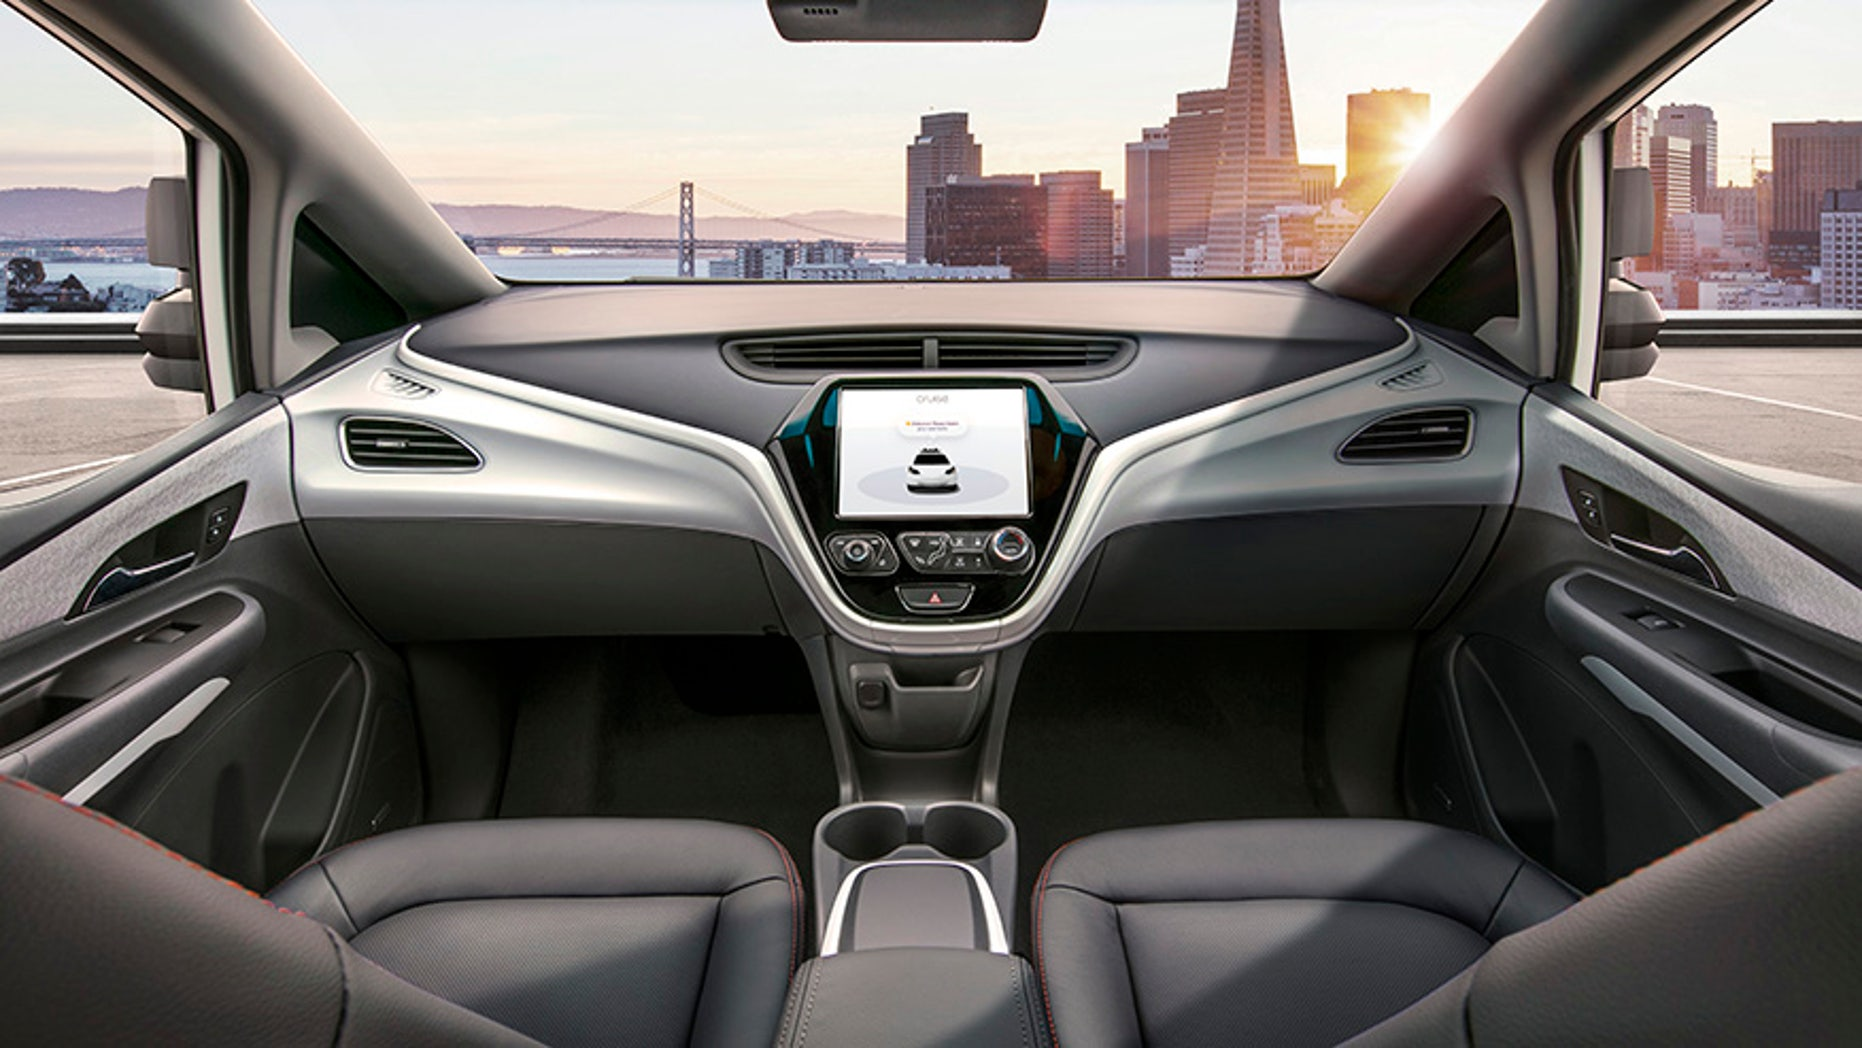 General Motors Reveals Autonomous Car With No Steering Wheel Fox News